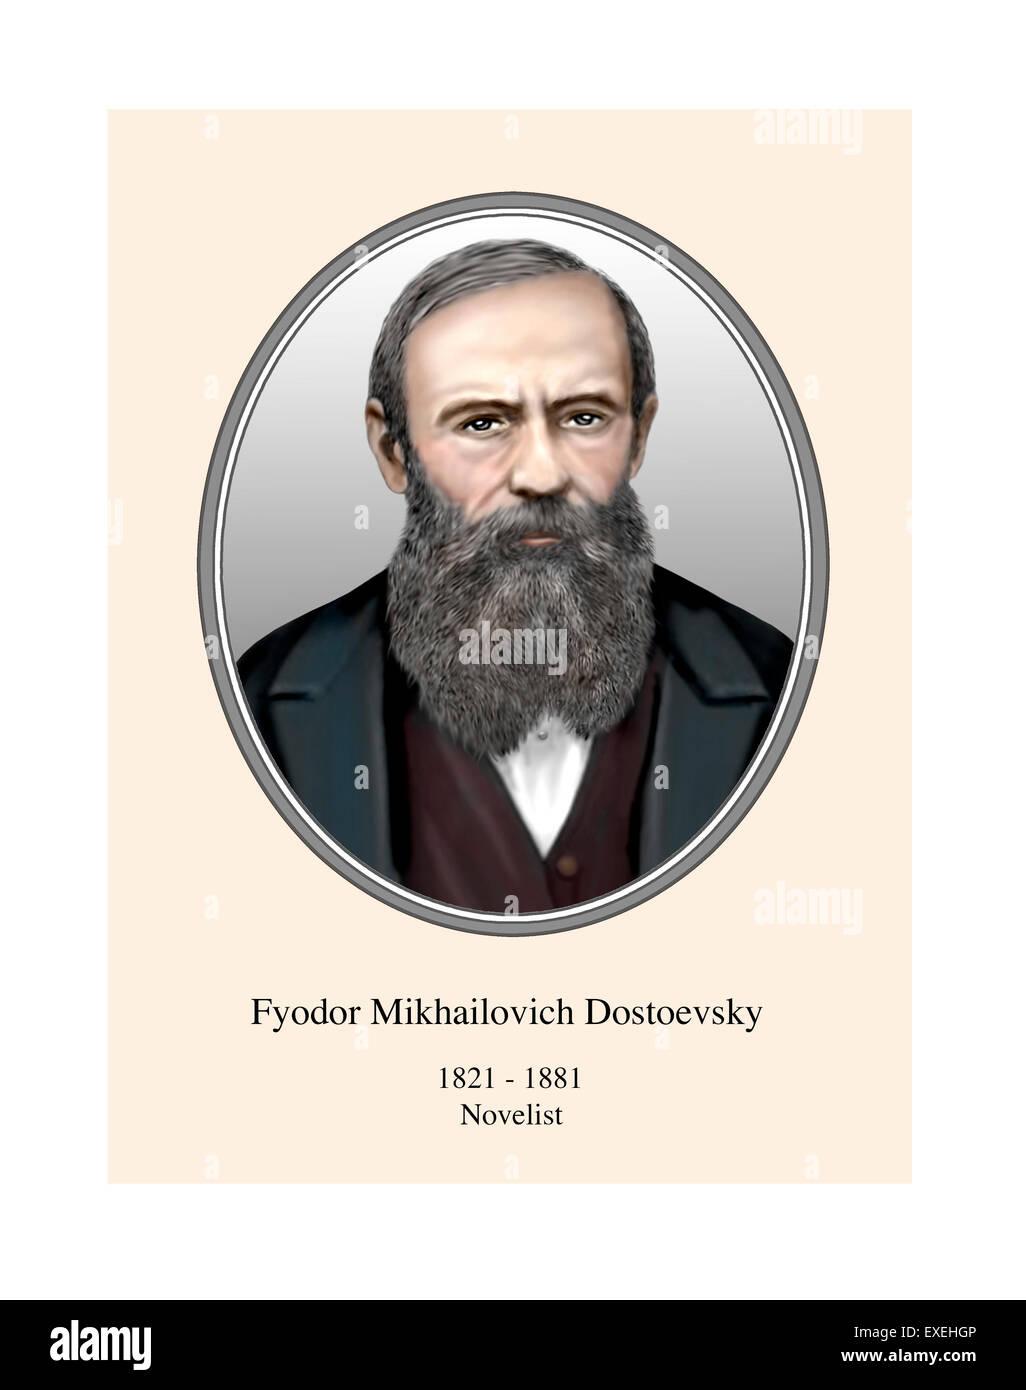 Fyodor Dostoevsky Portrait Modern Illustration - Stock Image